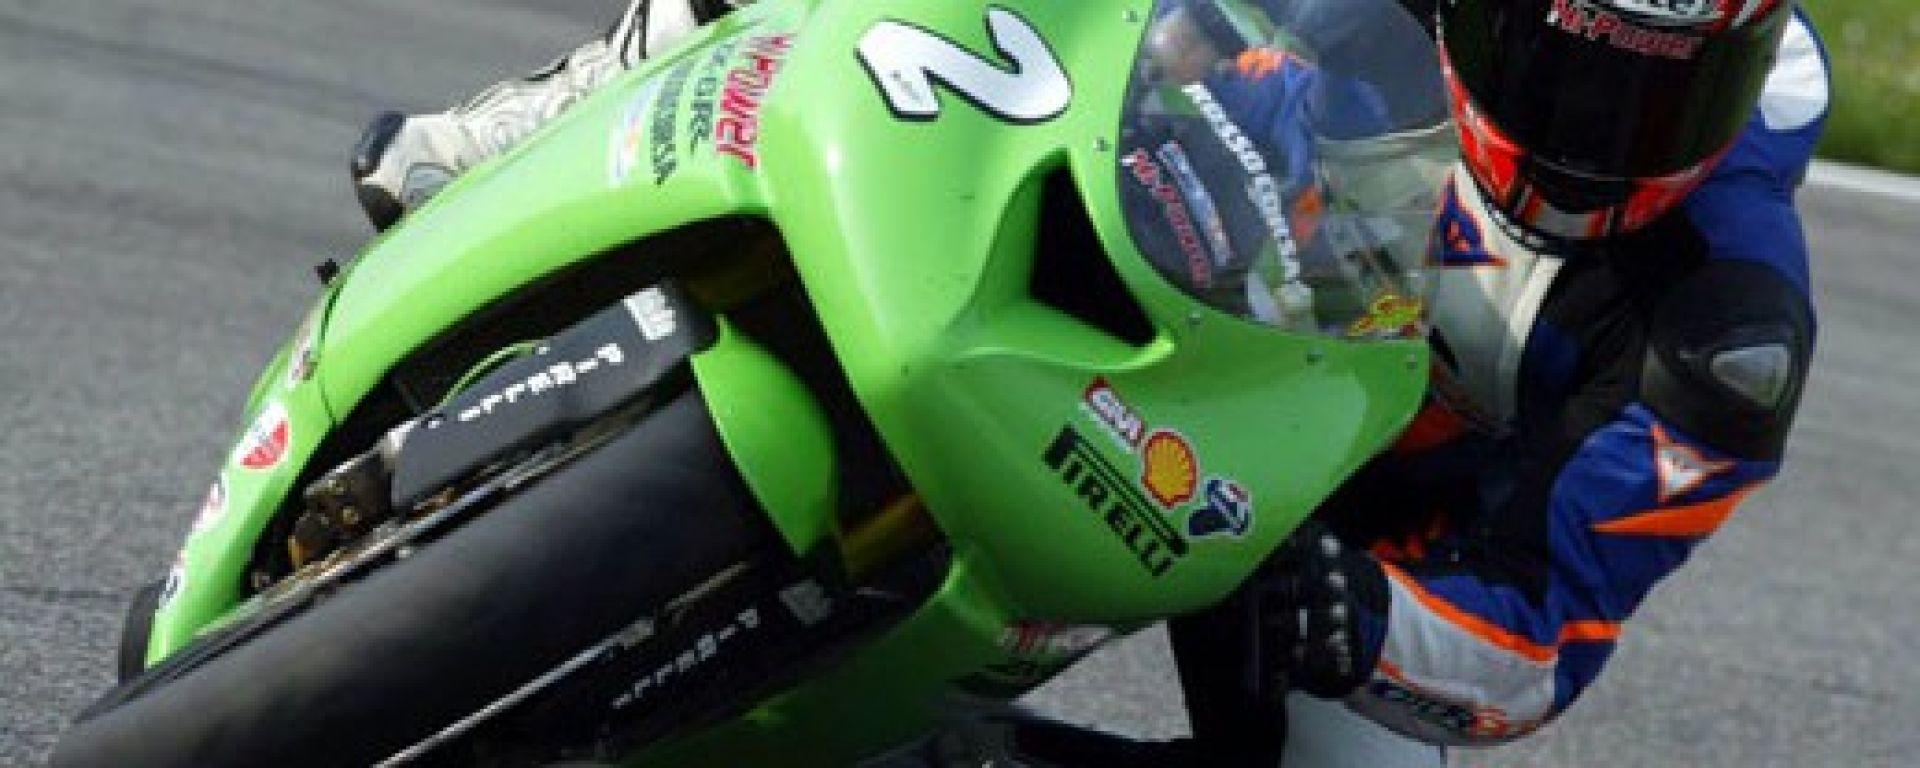 KAWASAKI: già pronto il Ninja Trophy 2006